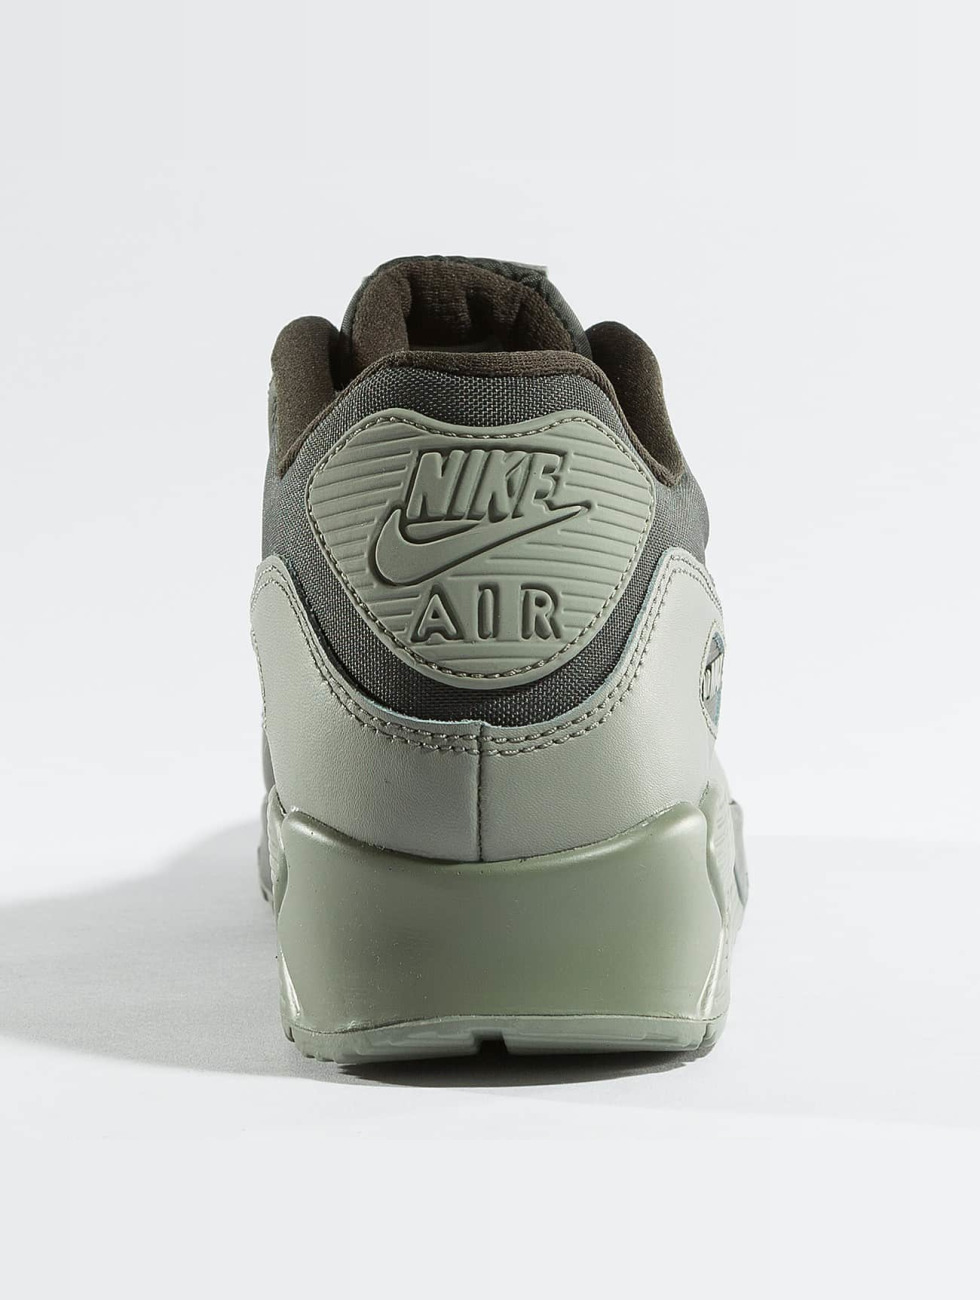 Nike Pattino / Sneaker Air Max 90 Essenziale Verde 364 688 cLRvXWOww